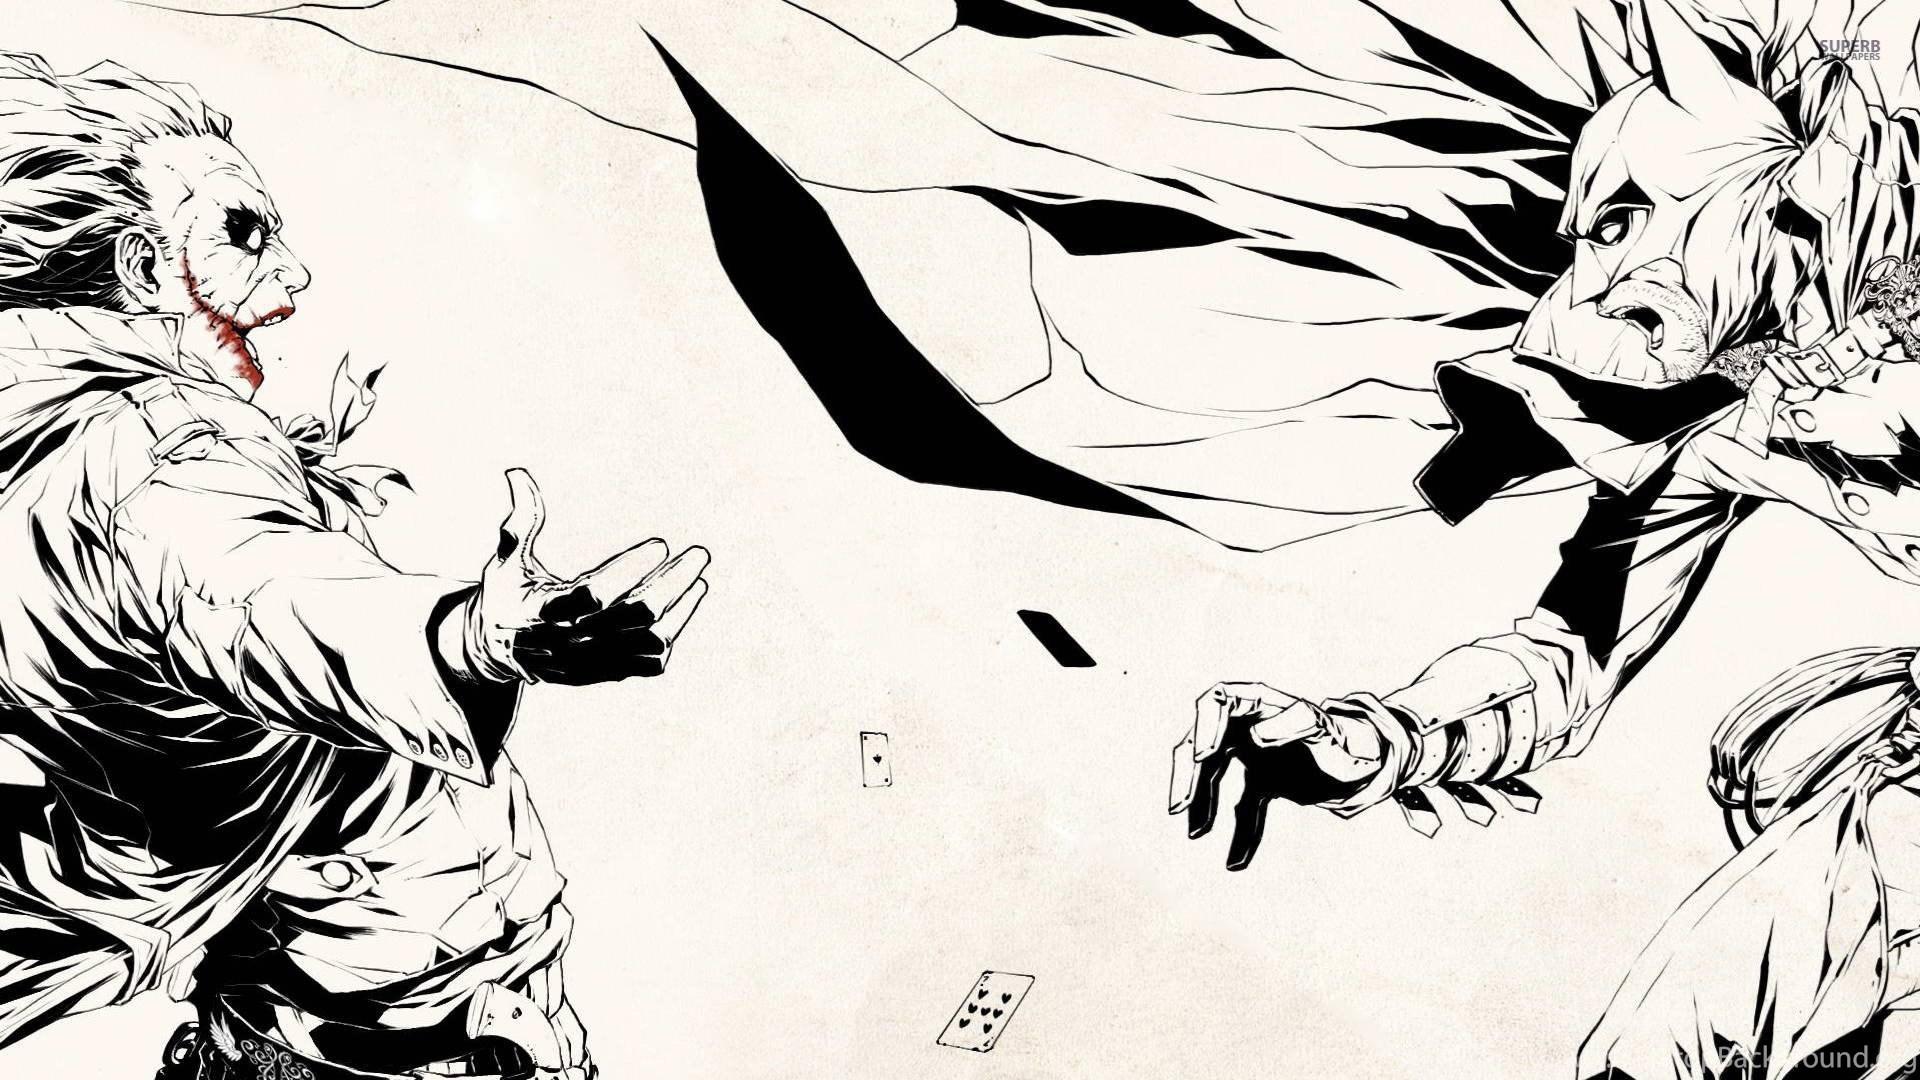 Batman And Joker Wallpapers HD Desktop Background